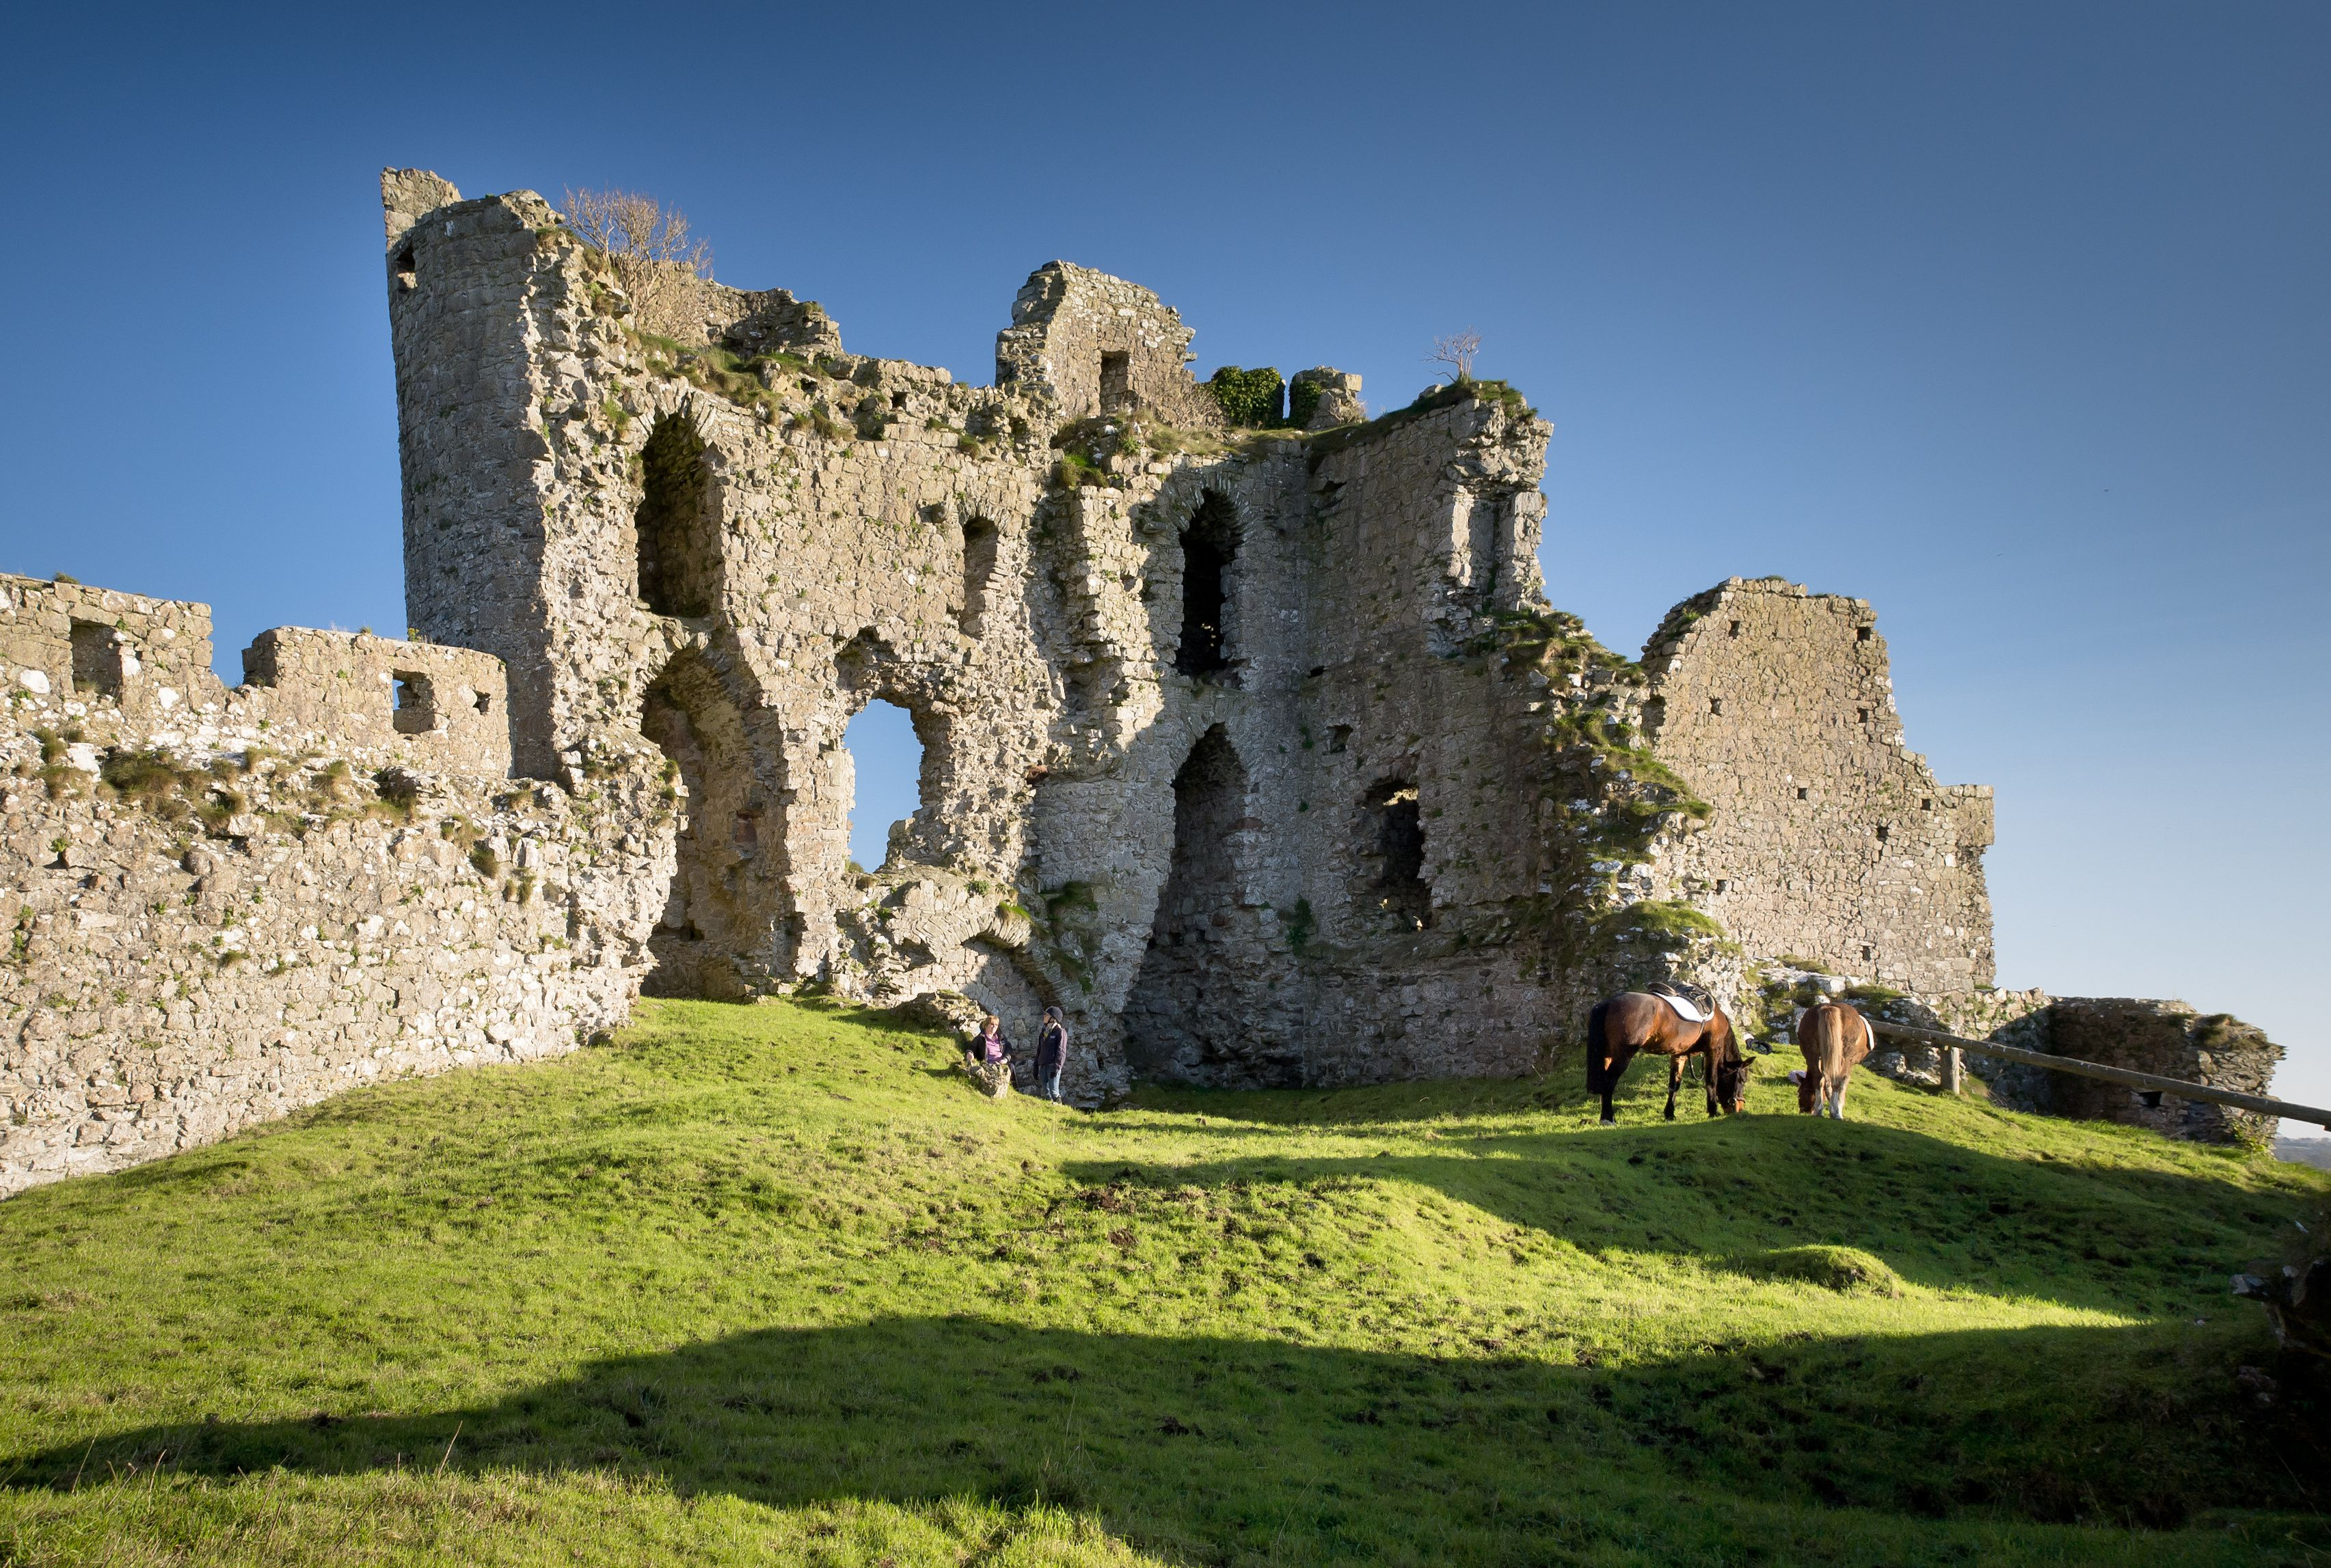 Castle Roche ruin in Dundalk, Louth, Ireland